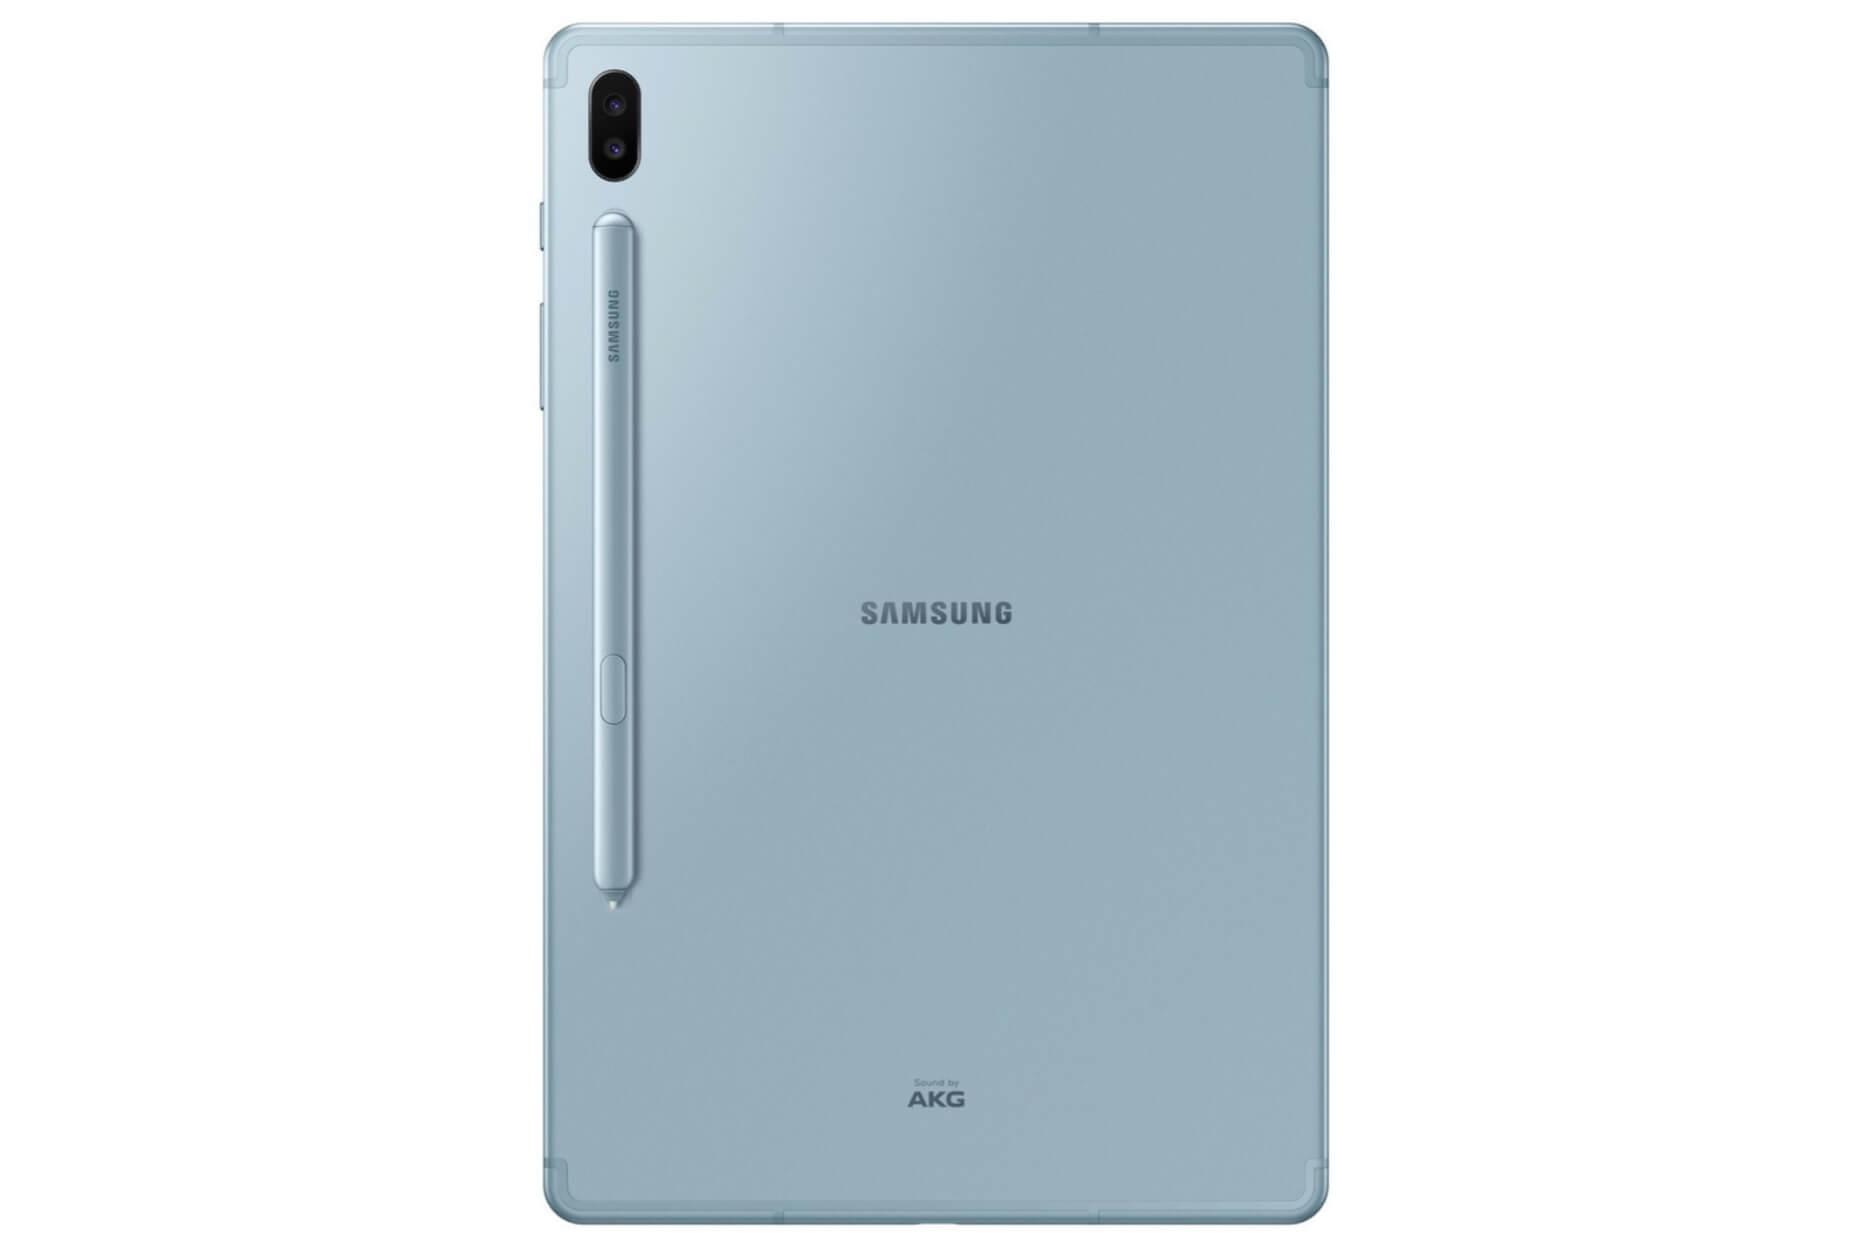 GTA 5 для смартфона и iPad от Samsung: итоги недели